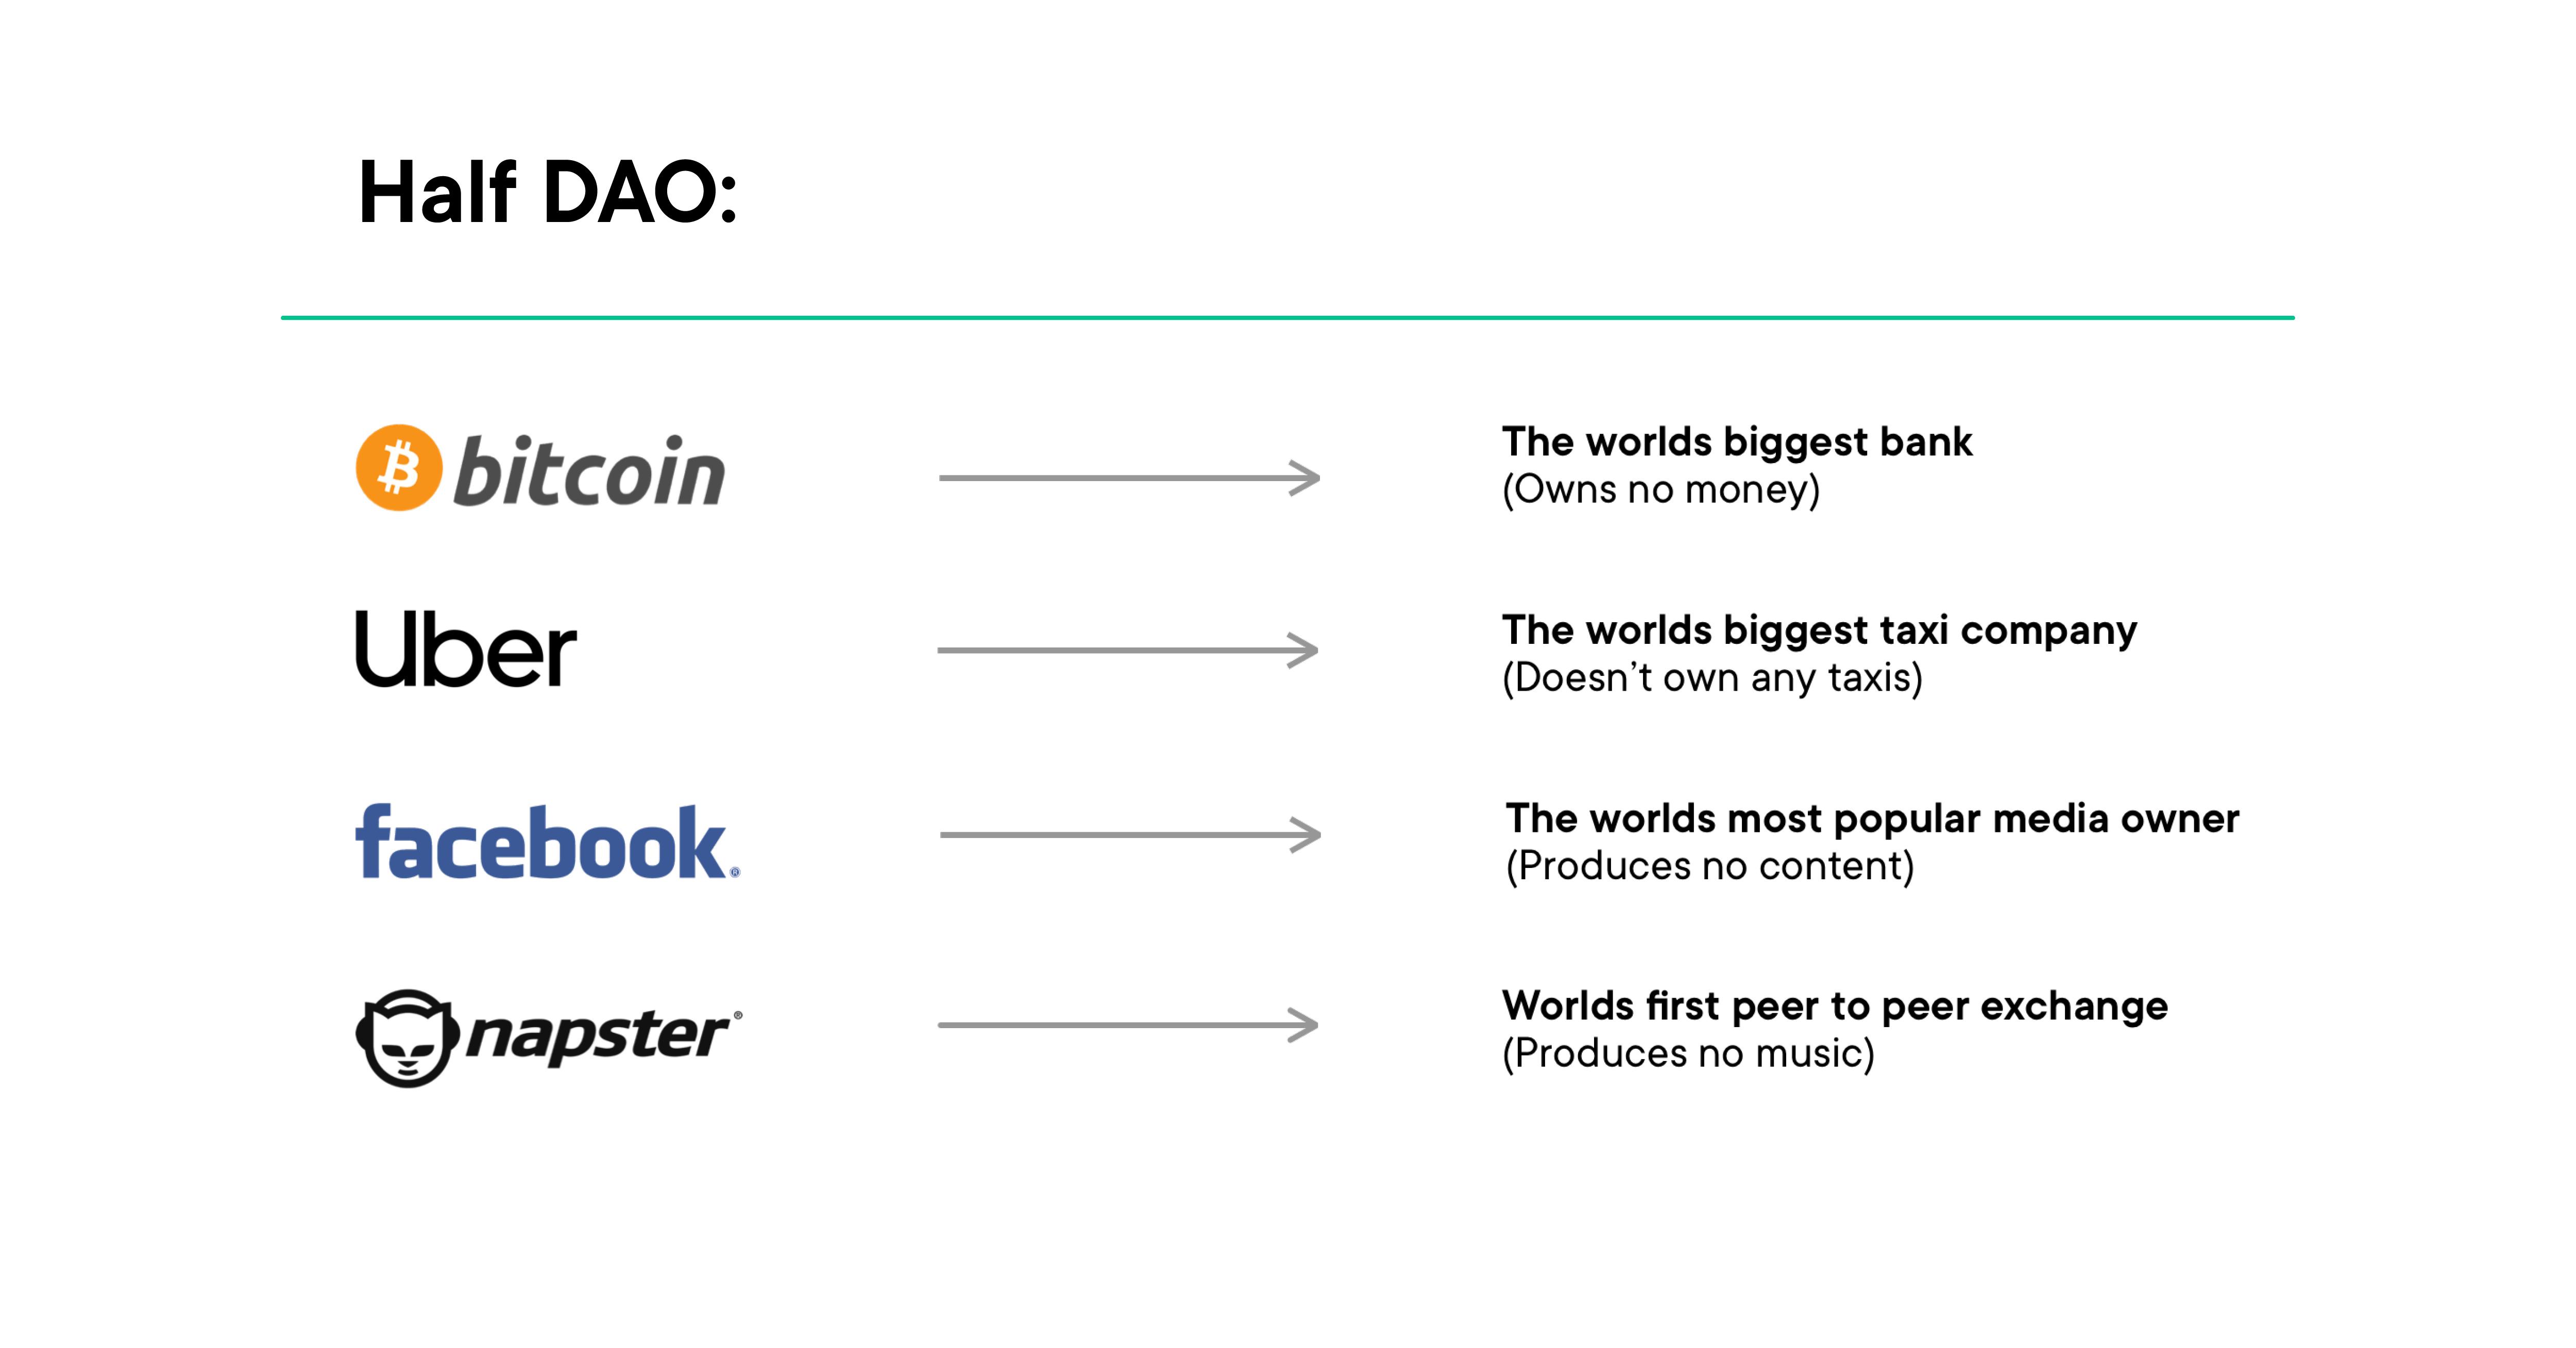 Half DAO Bitcoin, Uber, Facebook, Napster